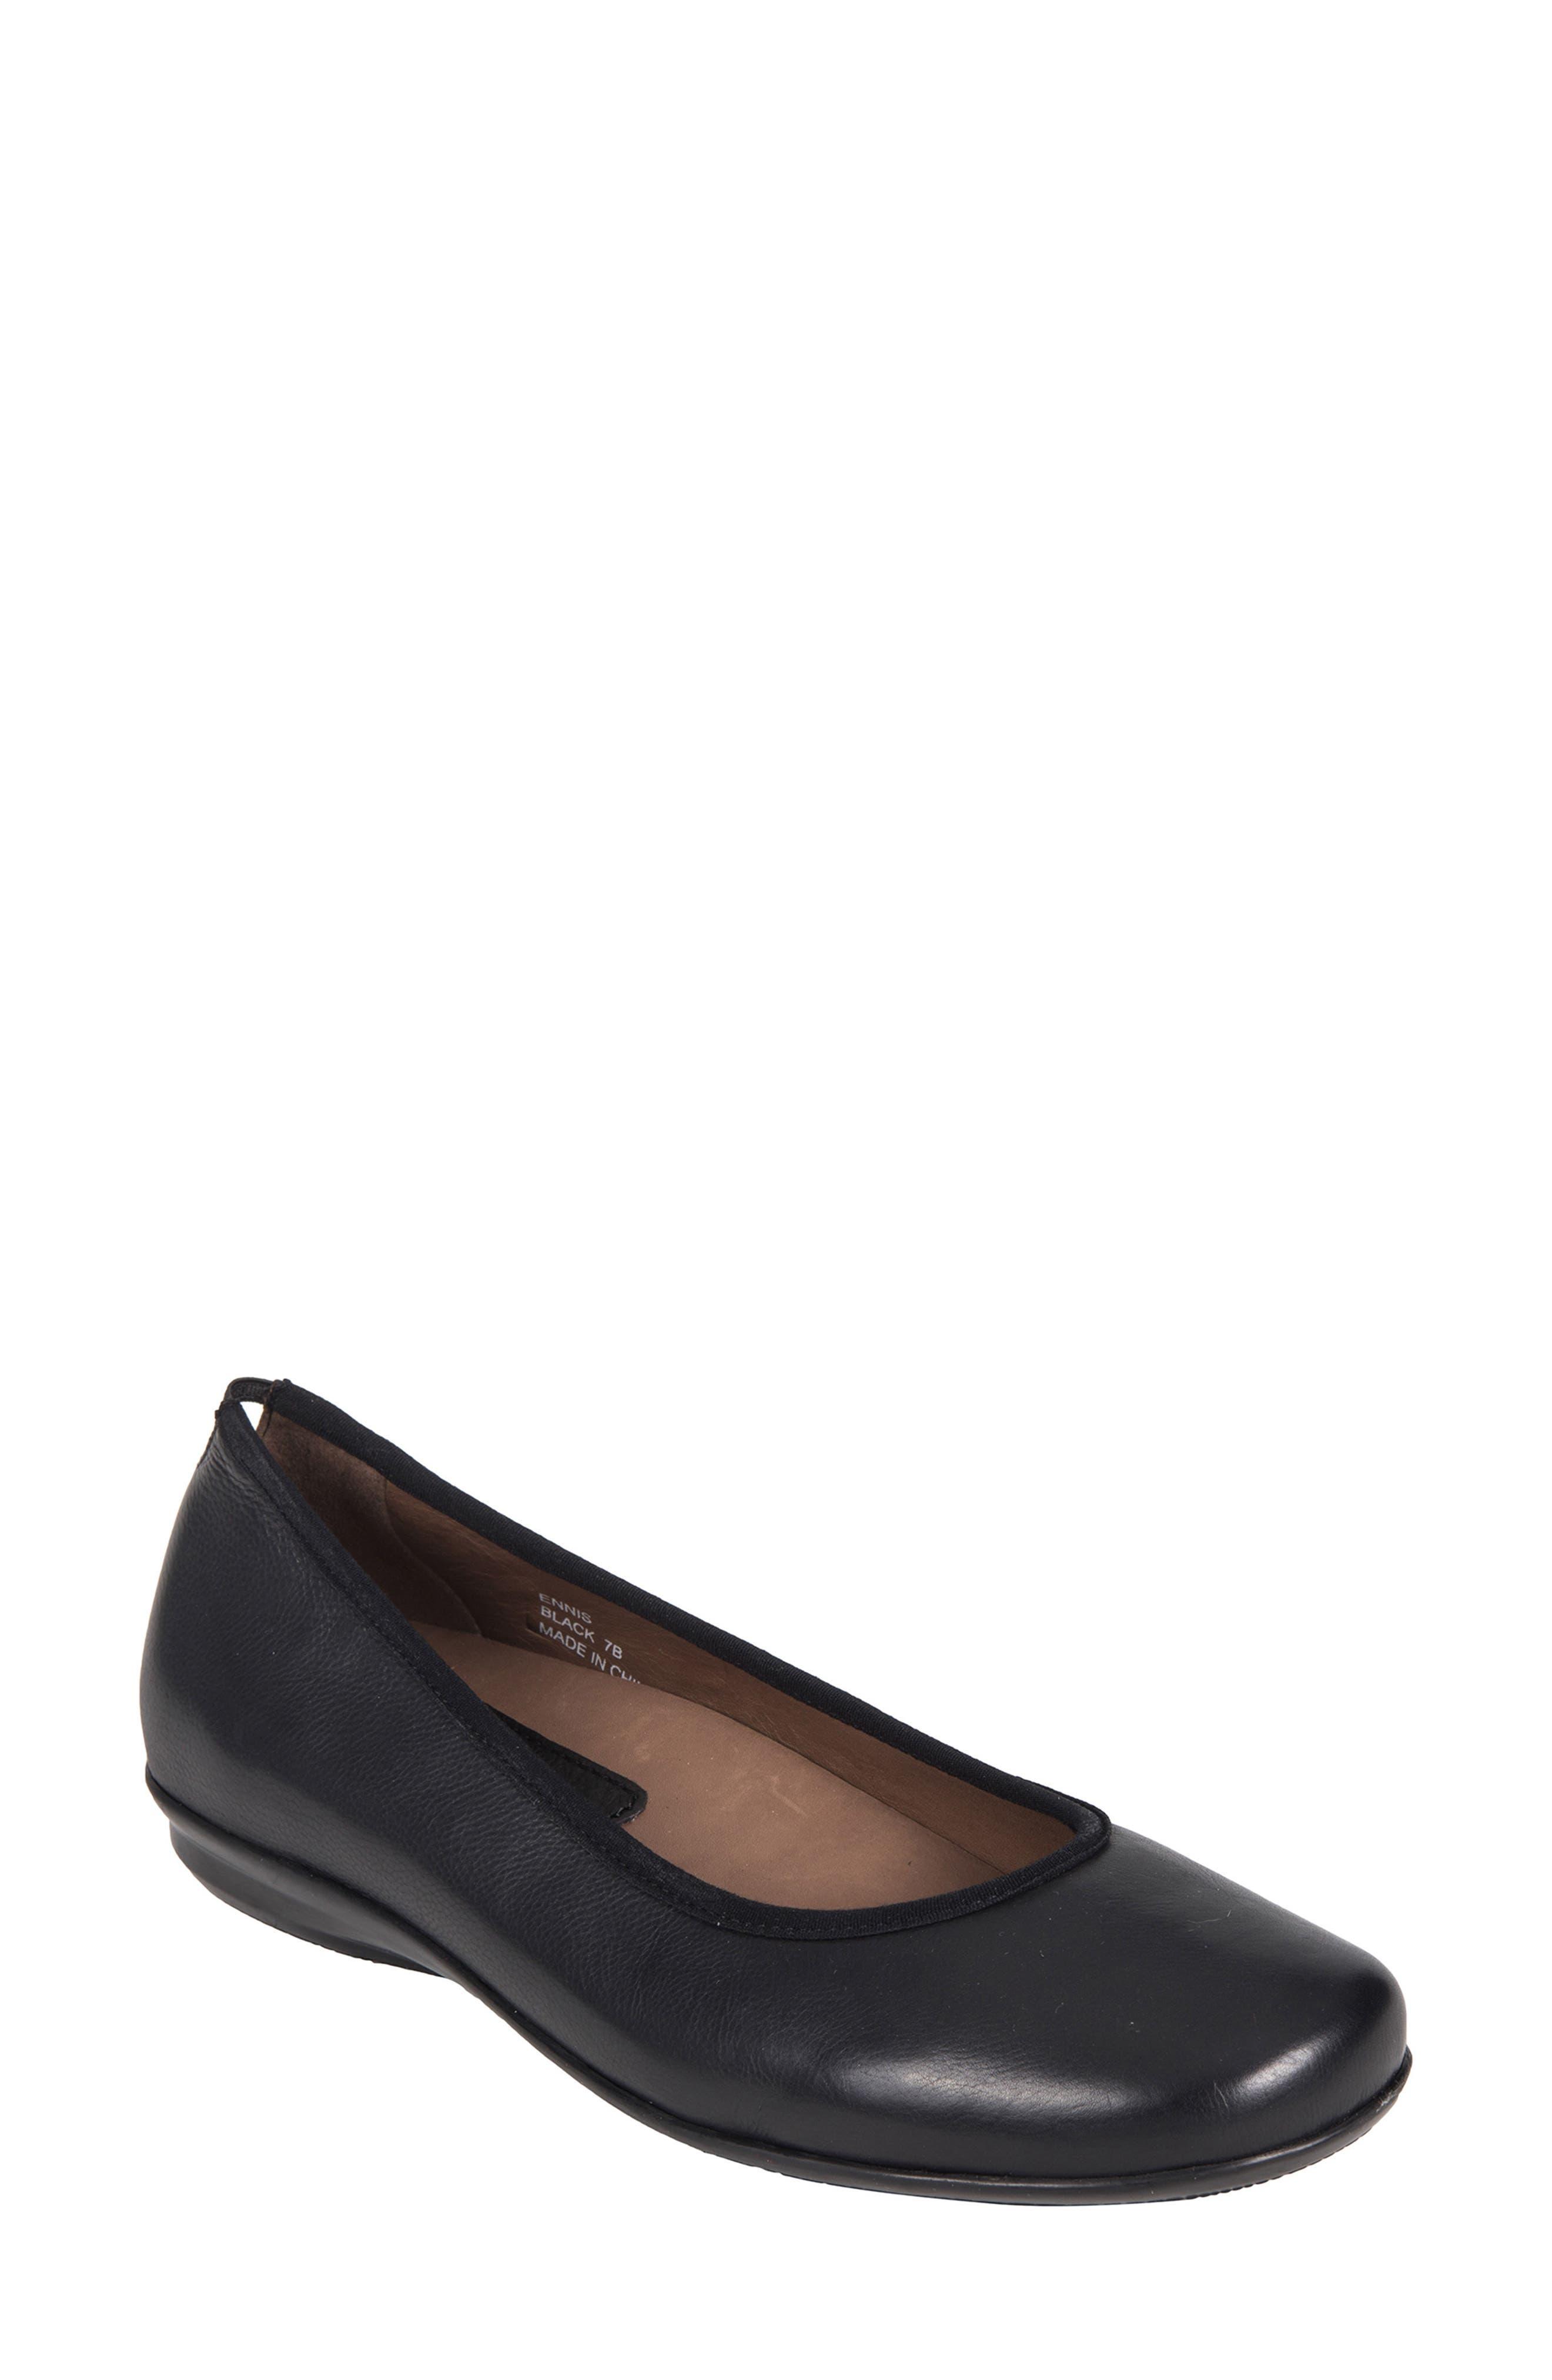 Ennis Flat,                             Main thumbnail 1, color,                             Black Leather